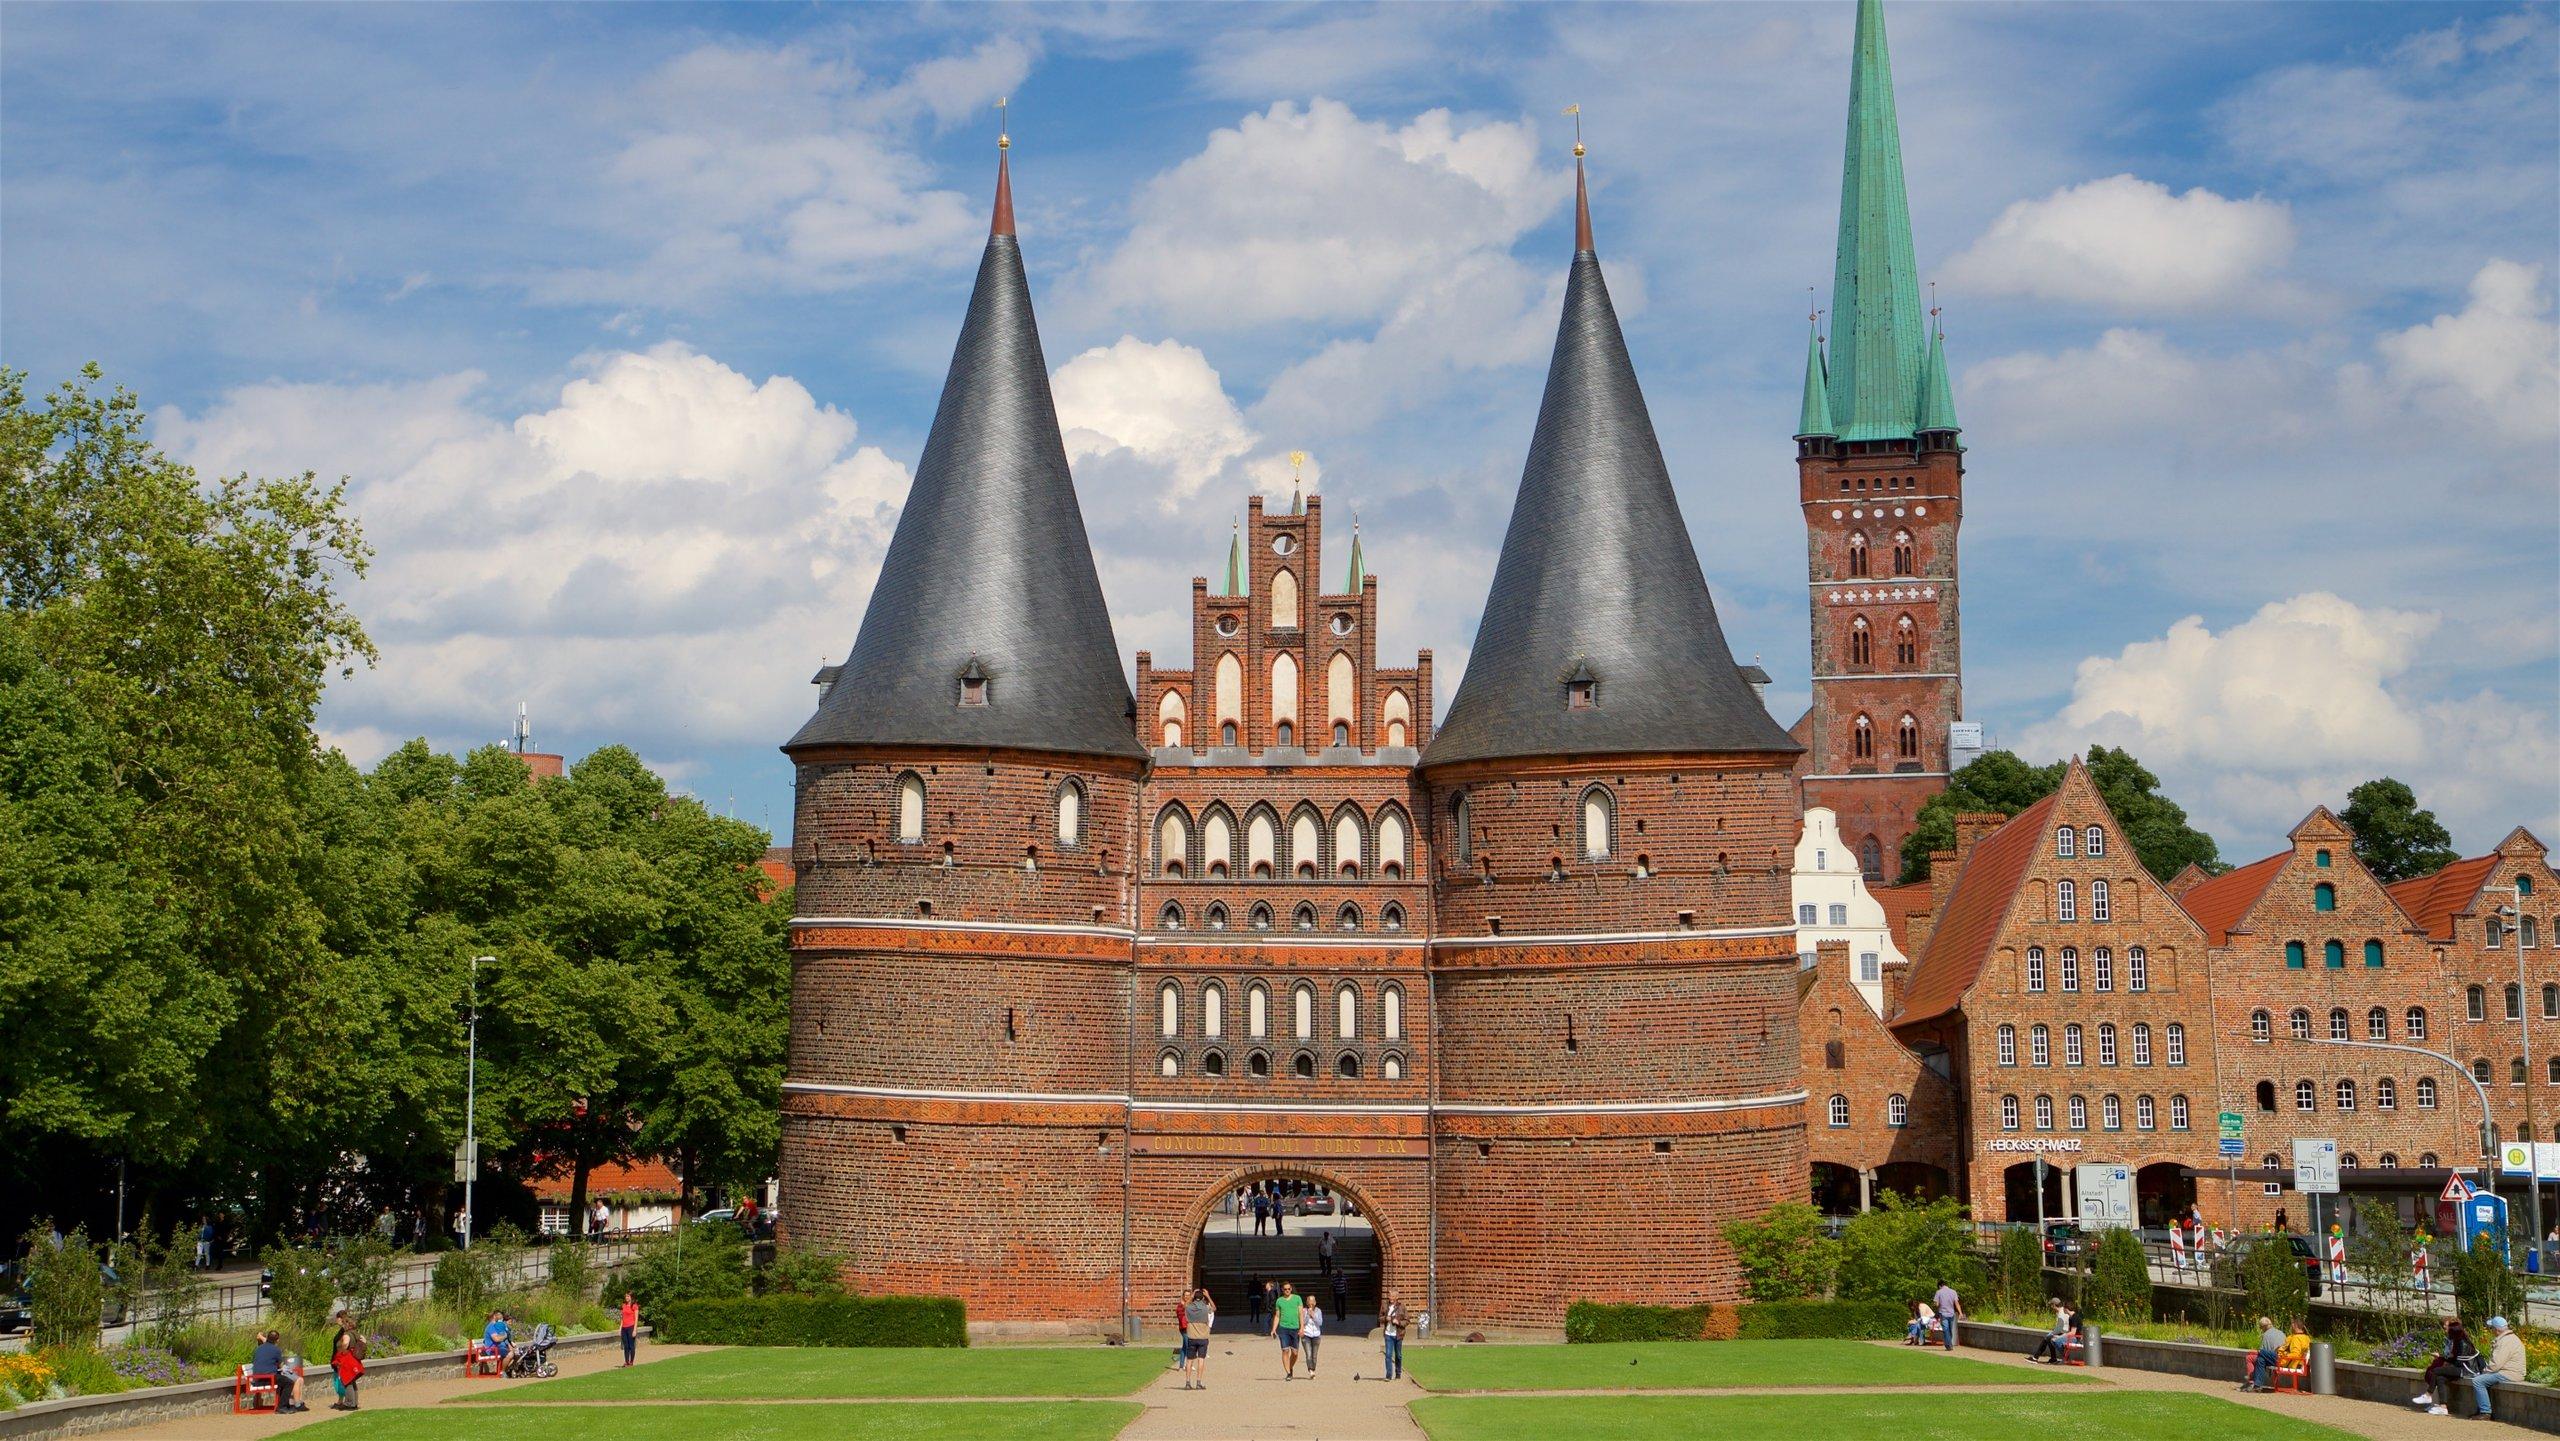 Schleswig-Holstein, Germany